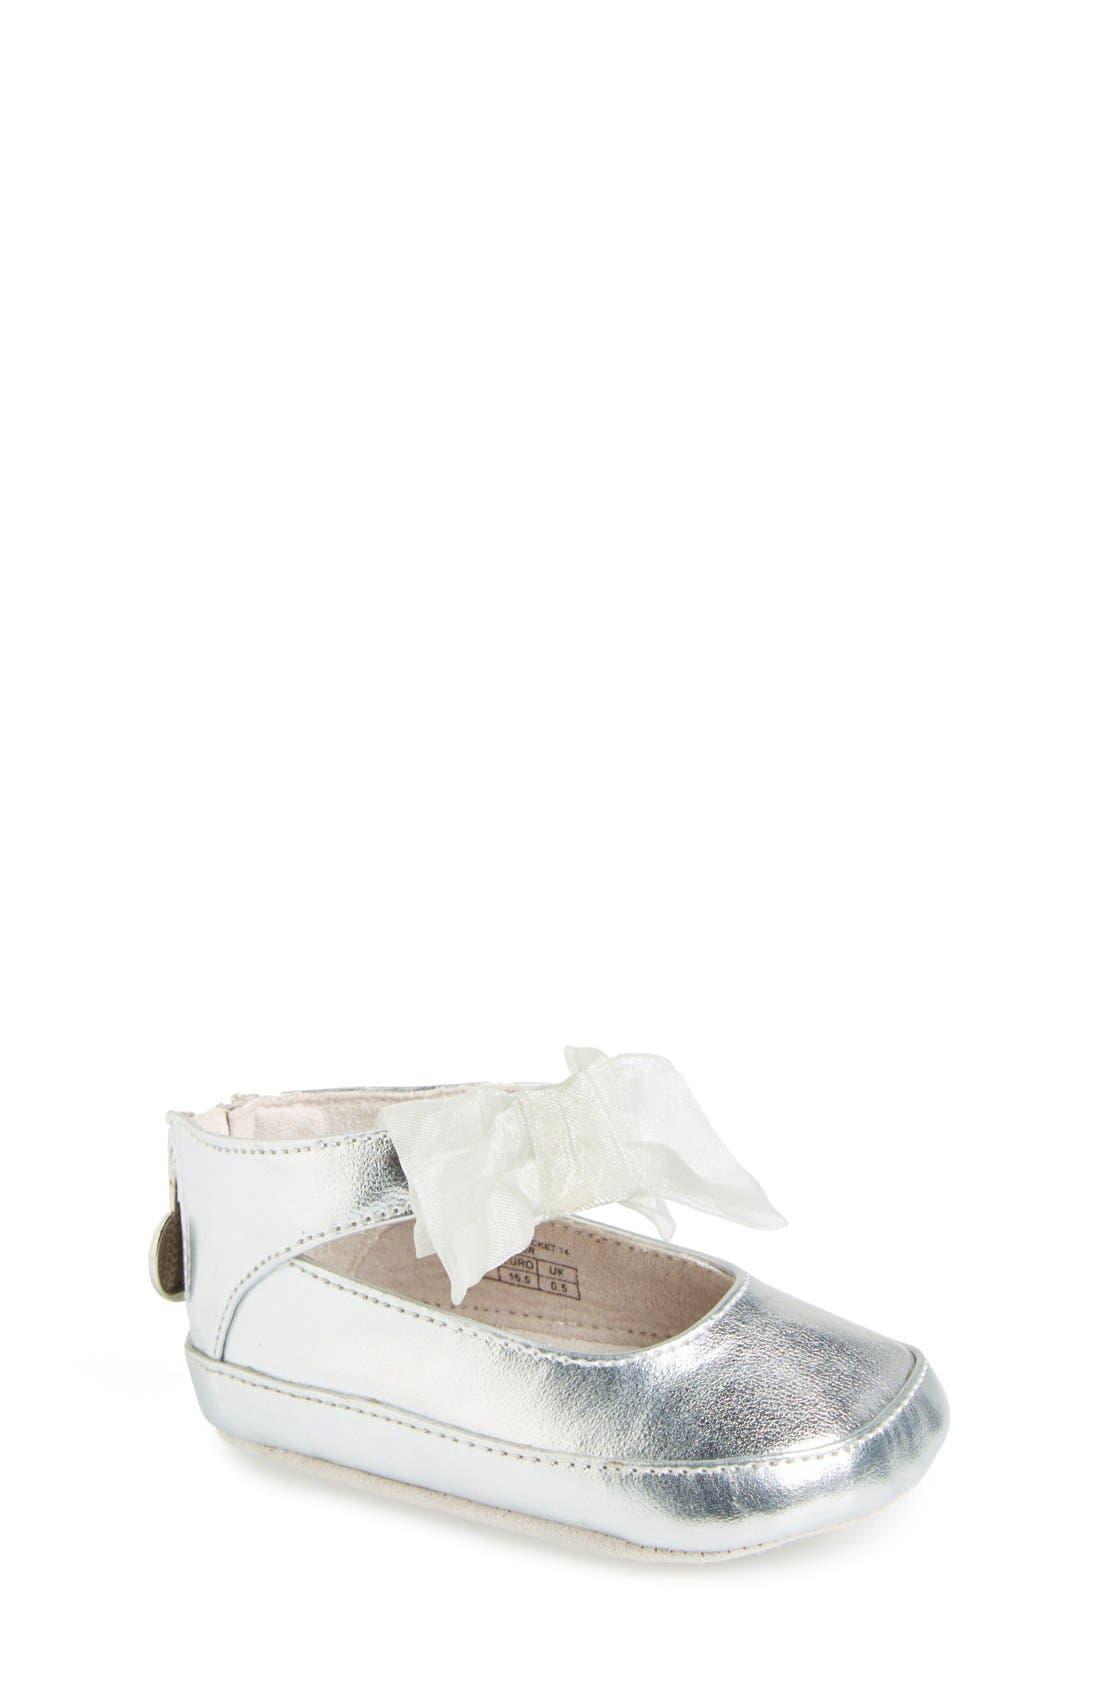 'Baby Nantucket' Crib Shoe,                         Main,                         color, Silver